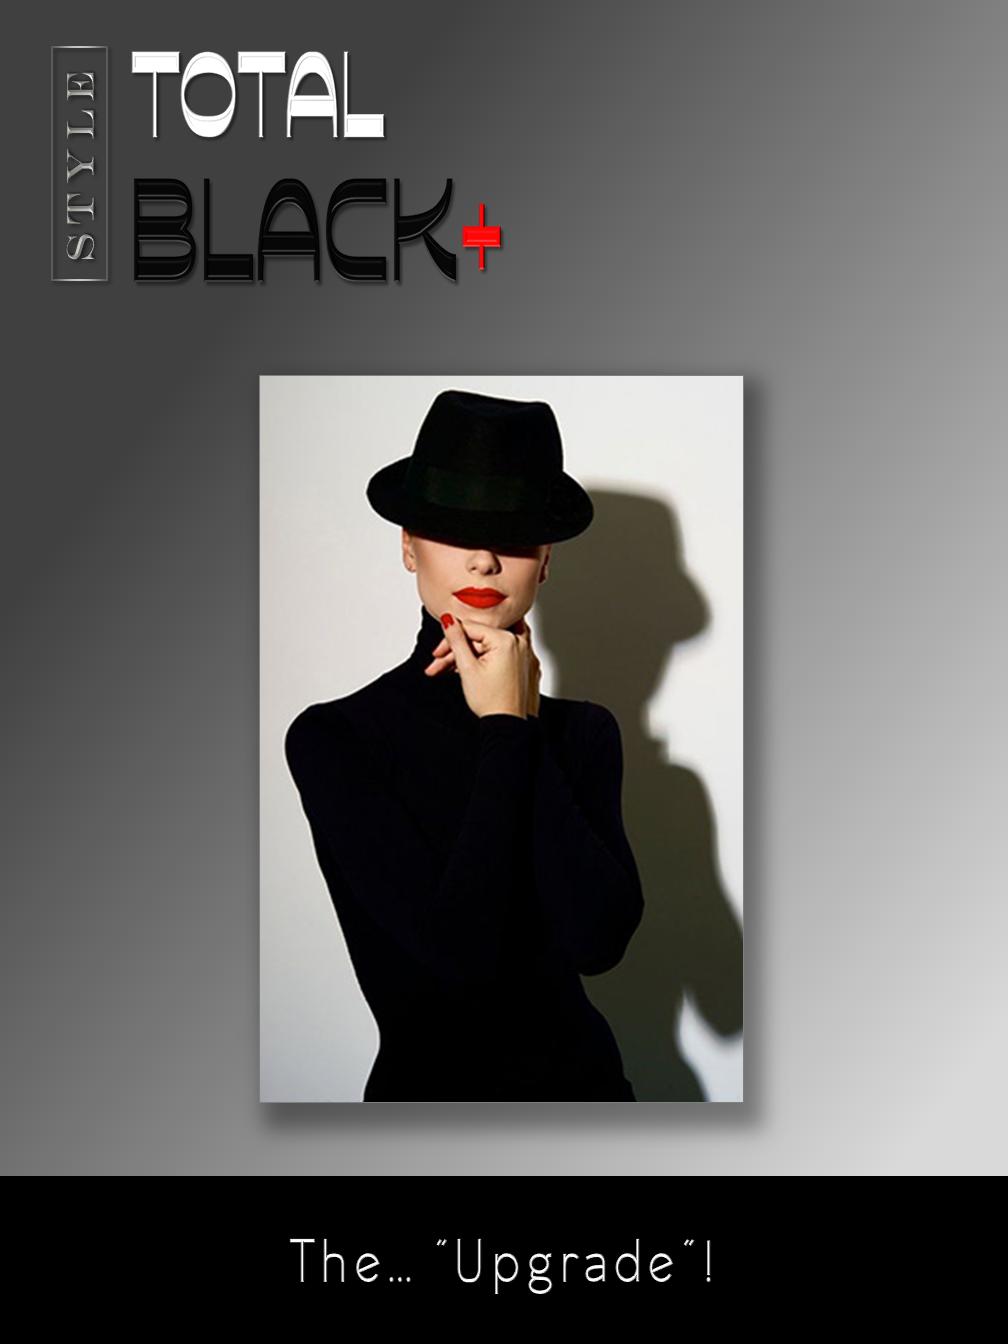 Total Black+